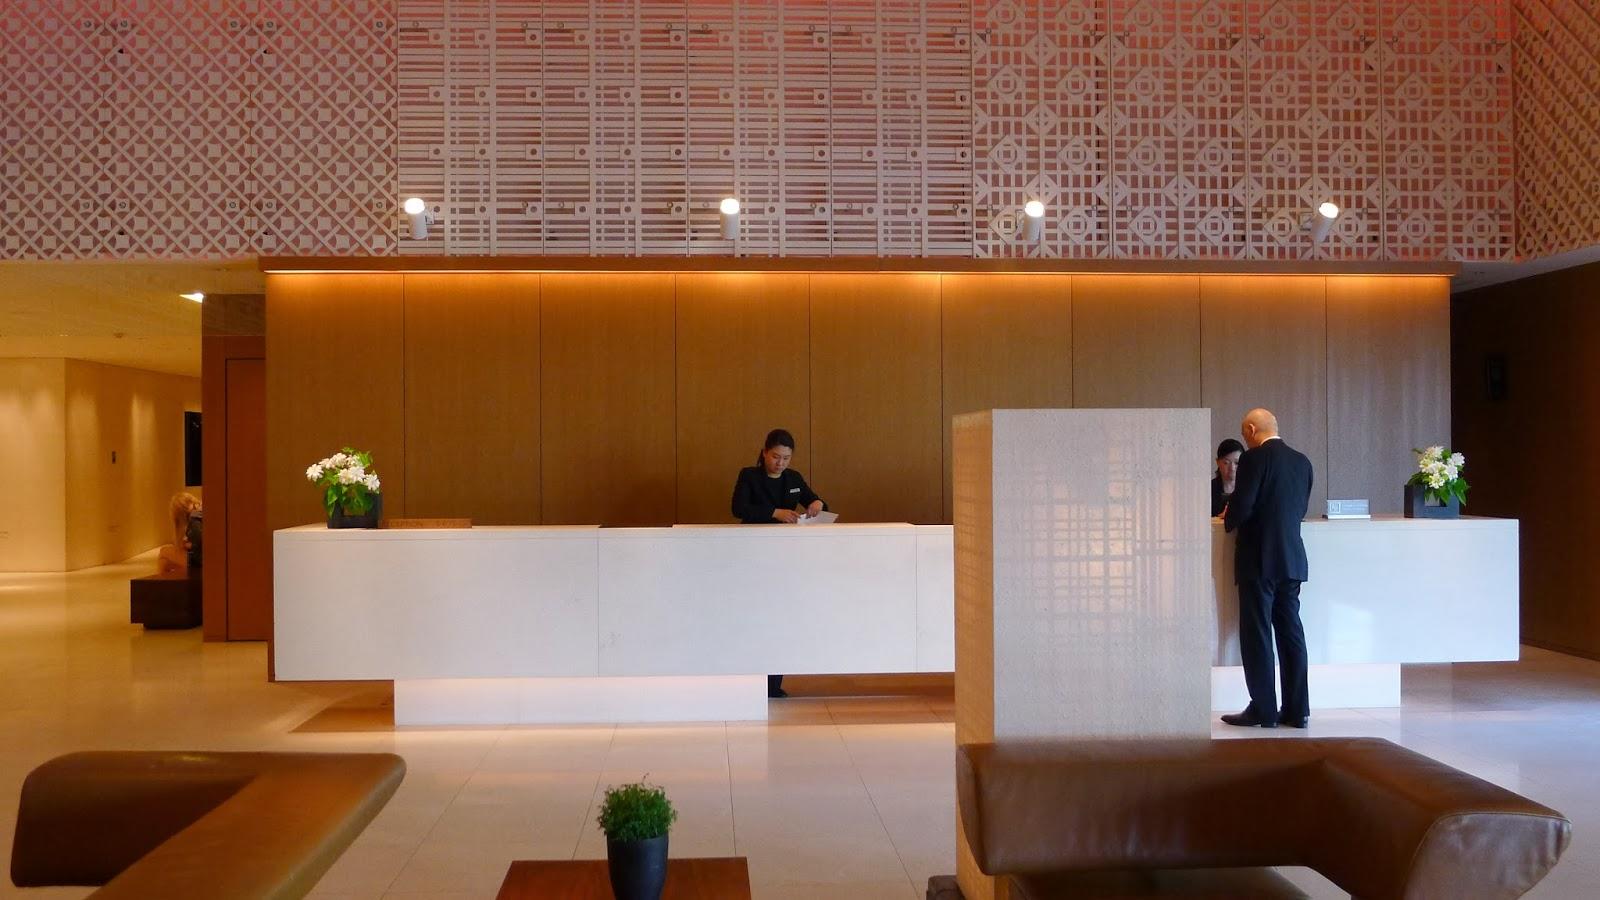 Dia art travel hyatt regency kyoto japan for Design hotel kyoto